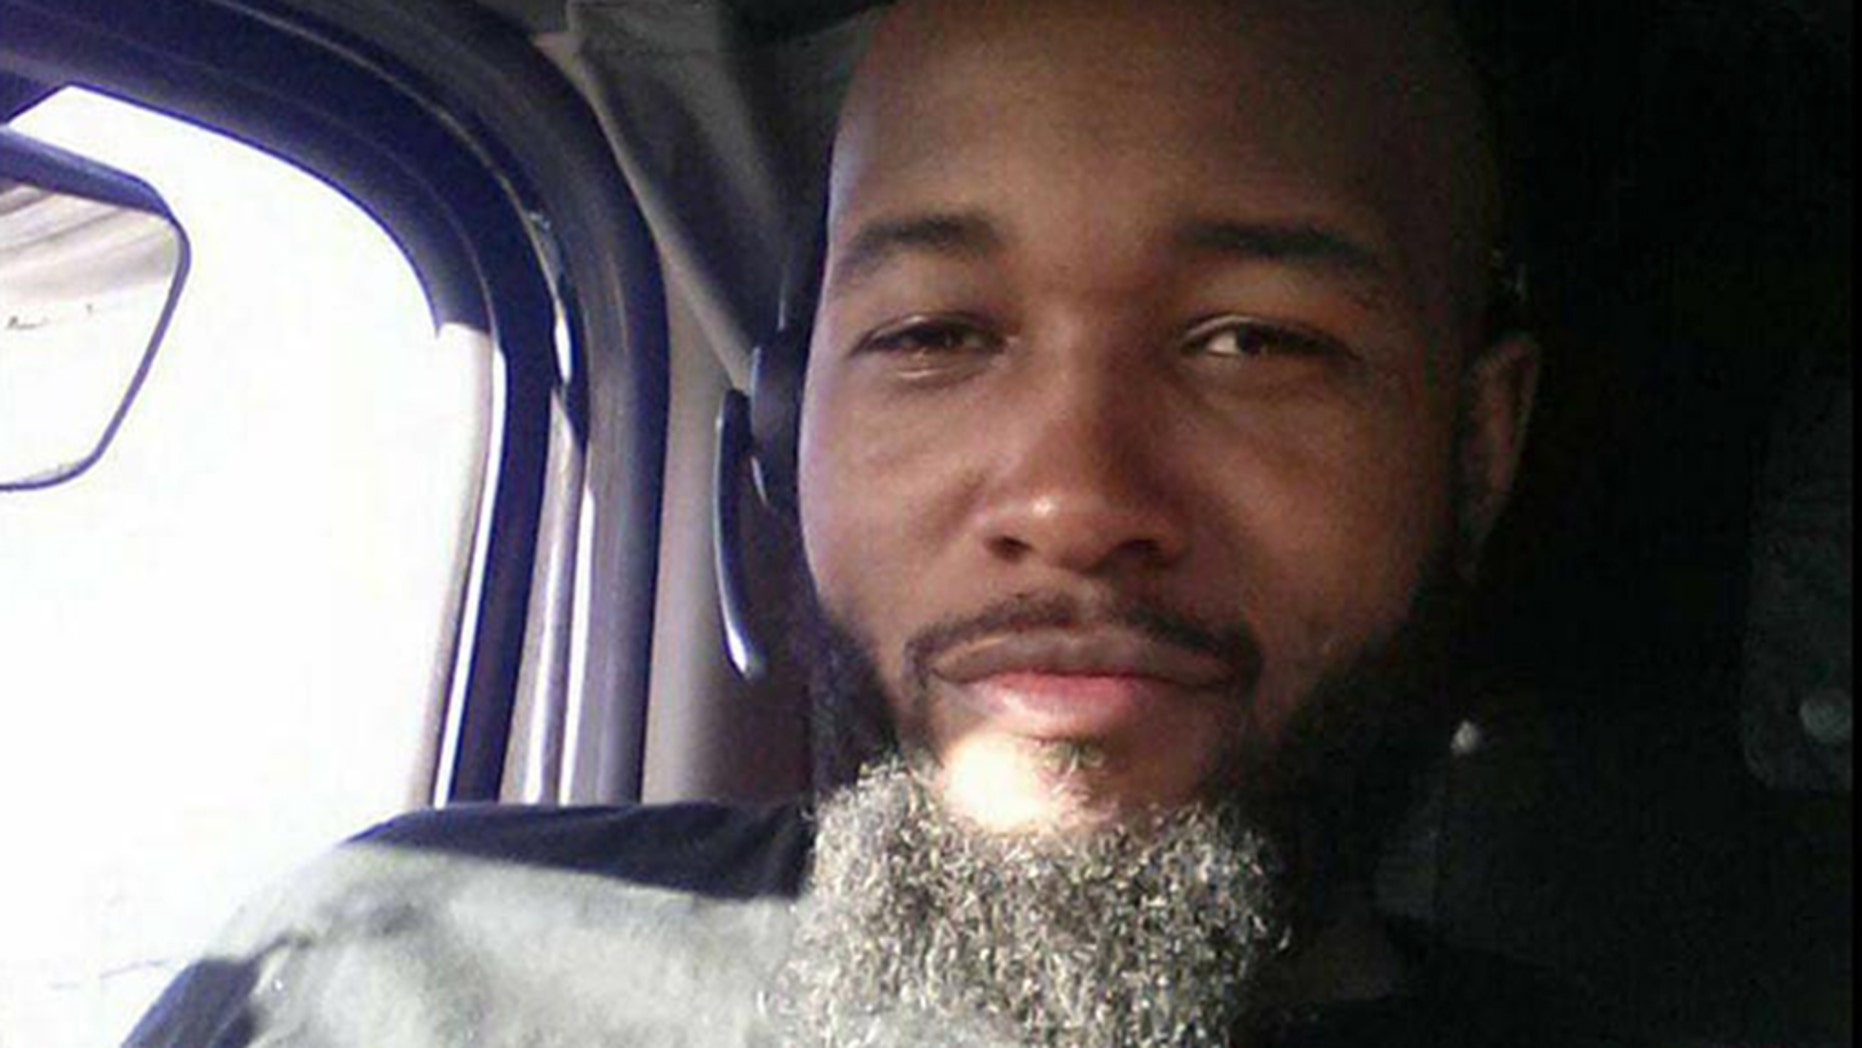 David Jones was shot and killed by Philadelphia police officer Ryan Pownall in June 2017.